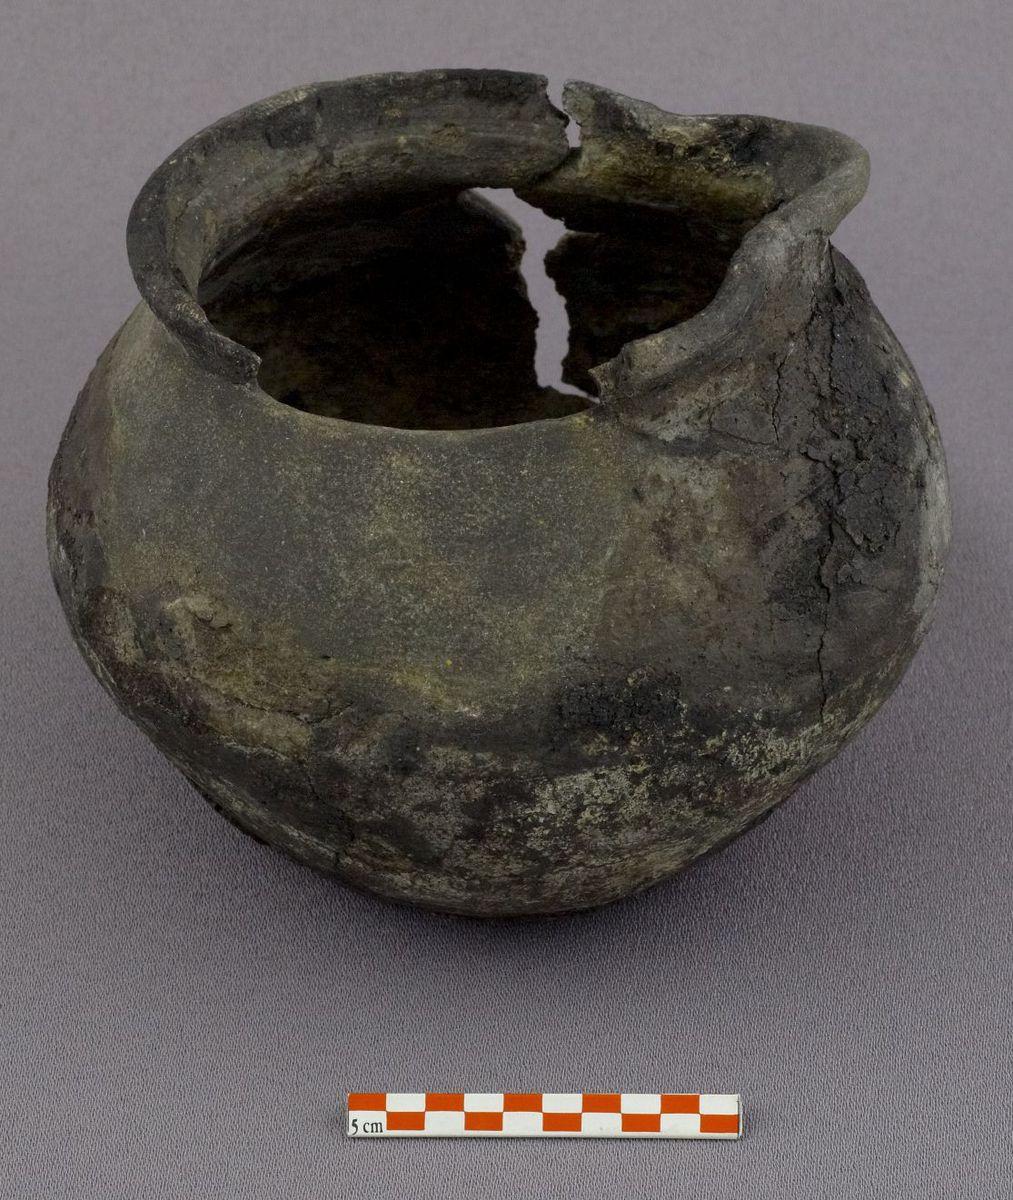 archéologie ; céramique 12e siècle 12e-13e siècle